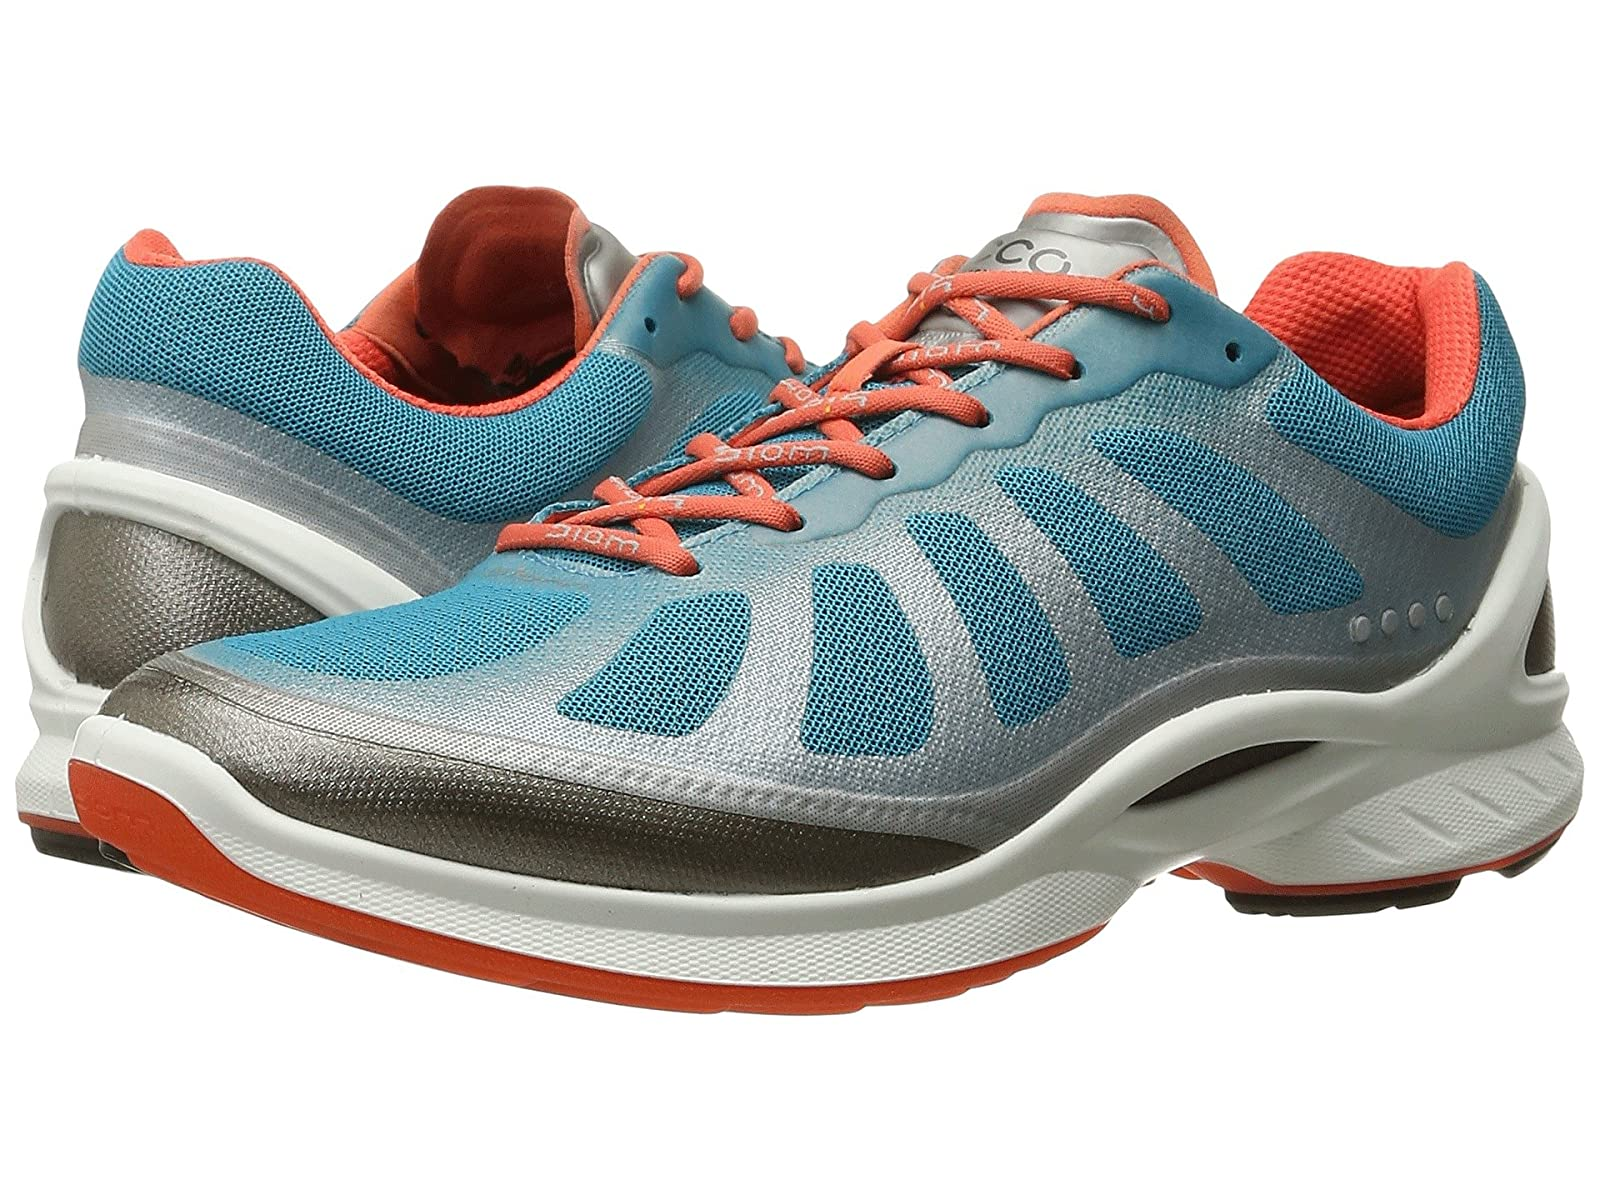 ECCO Sport Biom Fjuel RacerCheap and distinctive eye-catching shoes